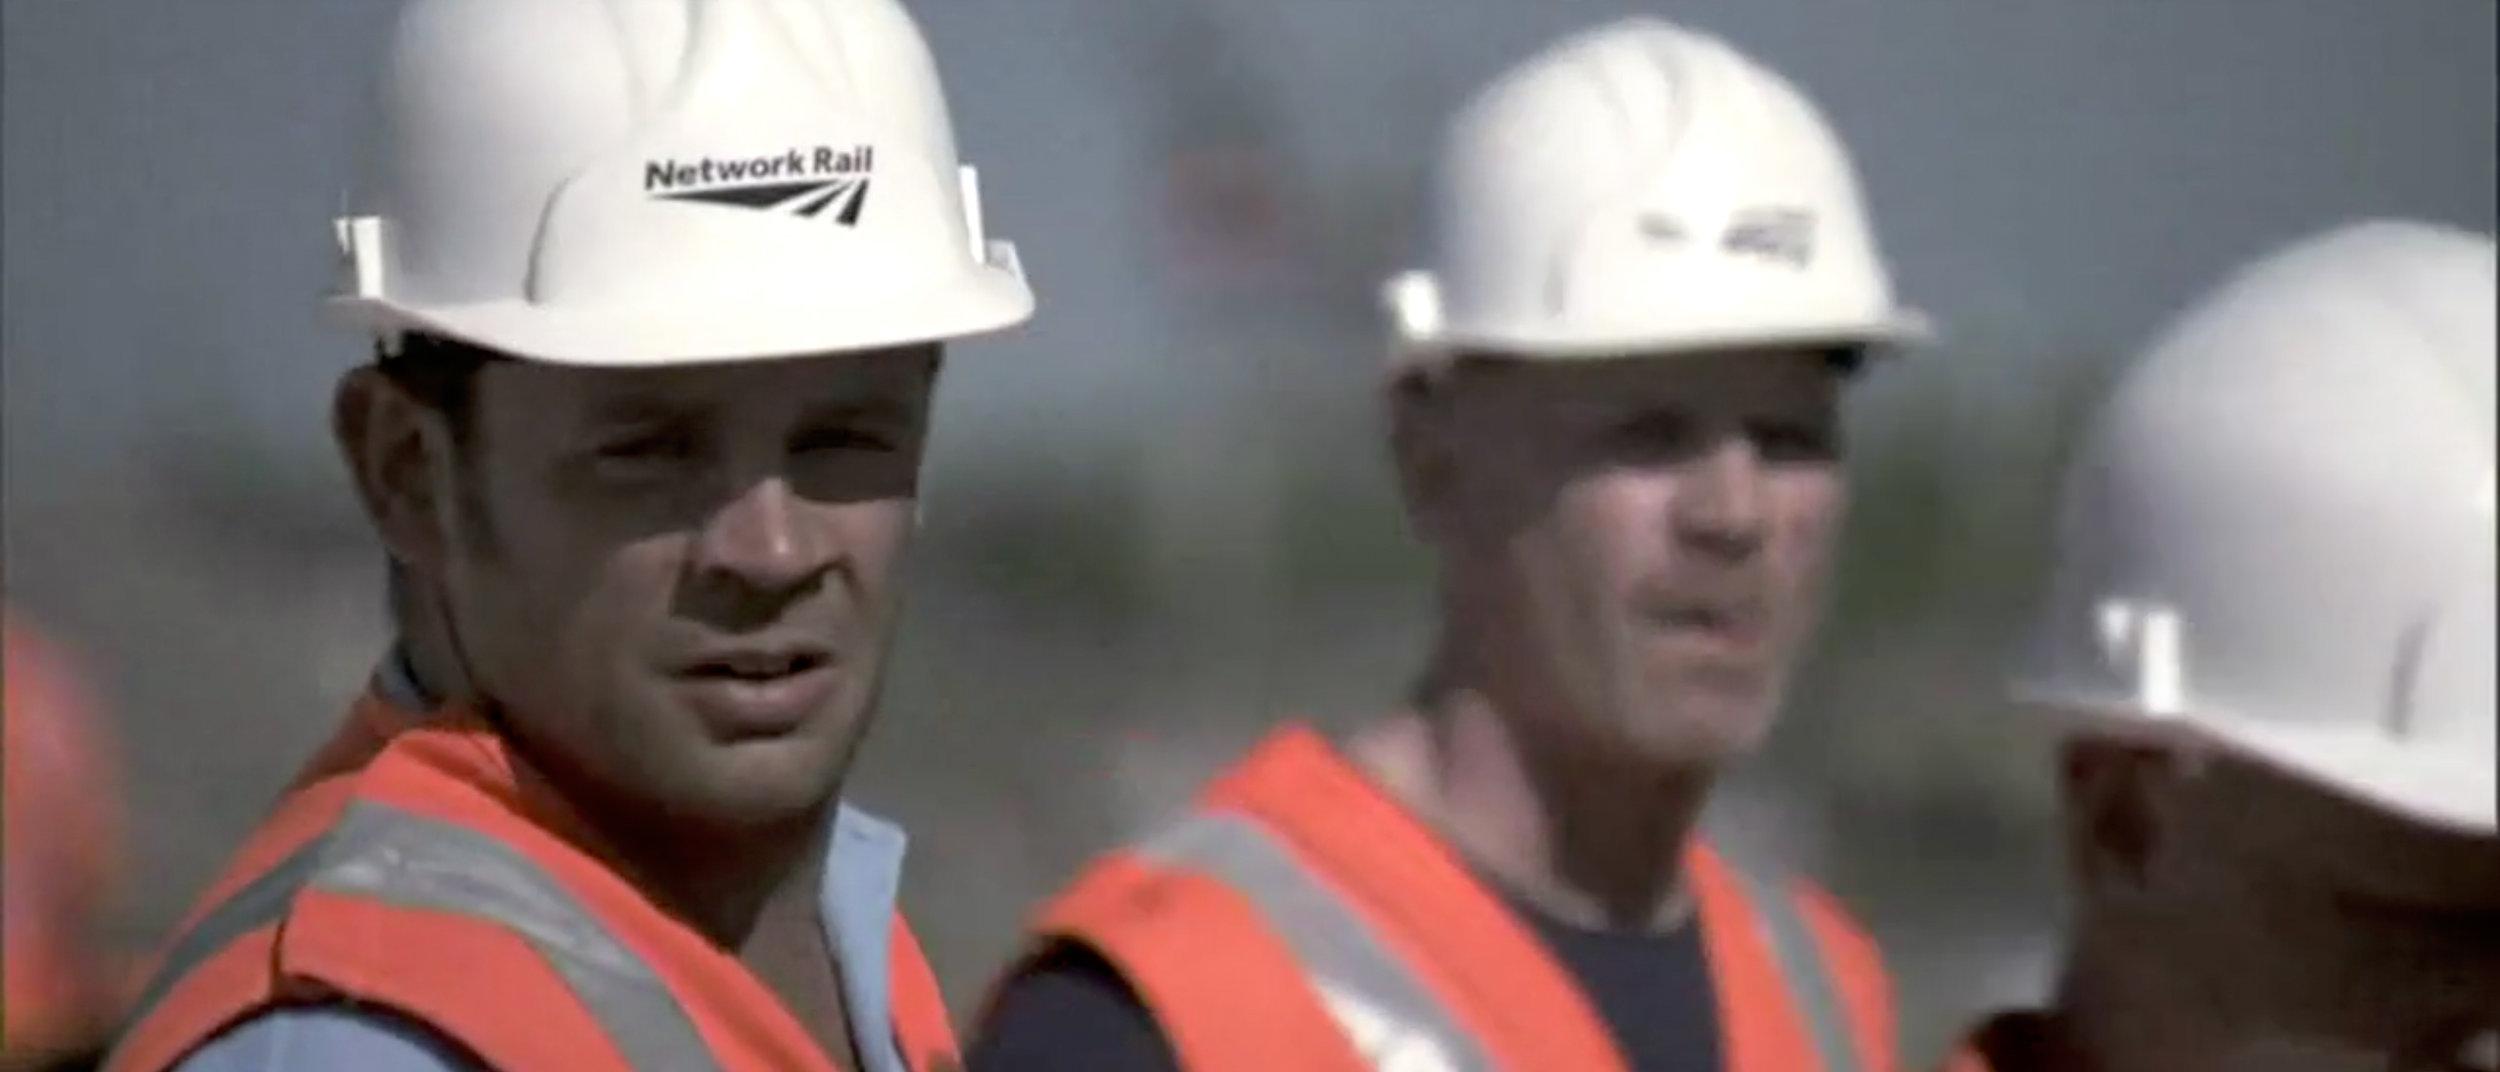 What Happened?: Network Rail